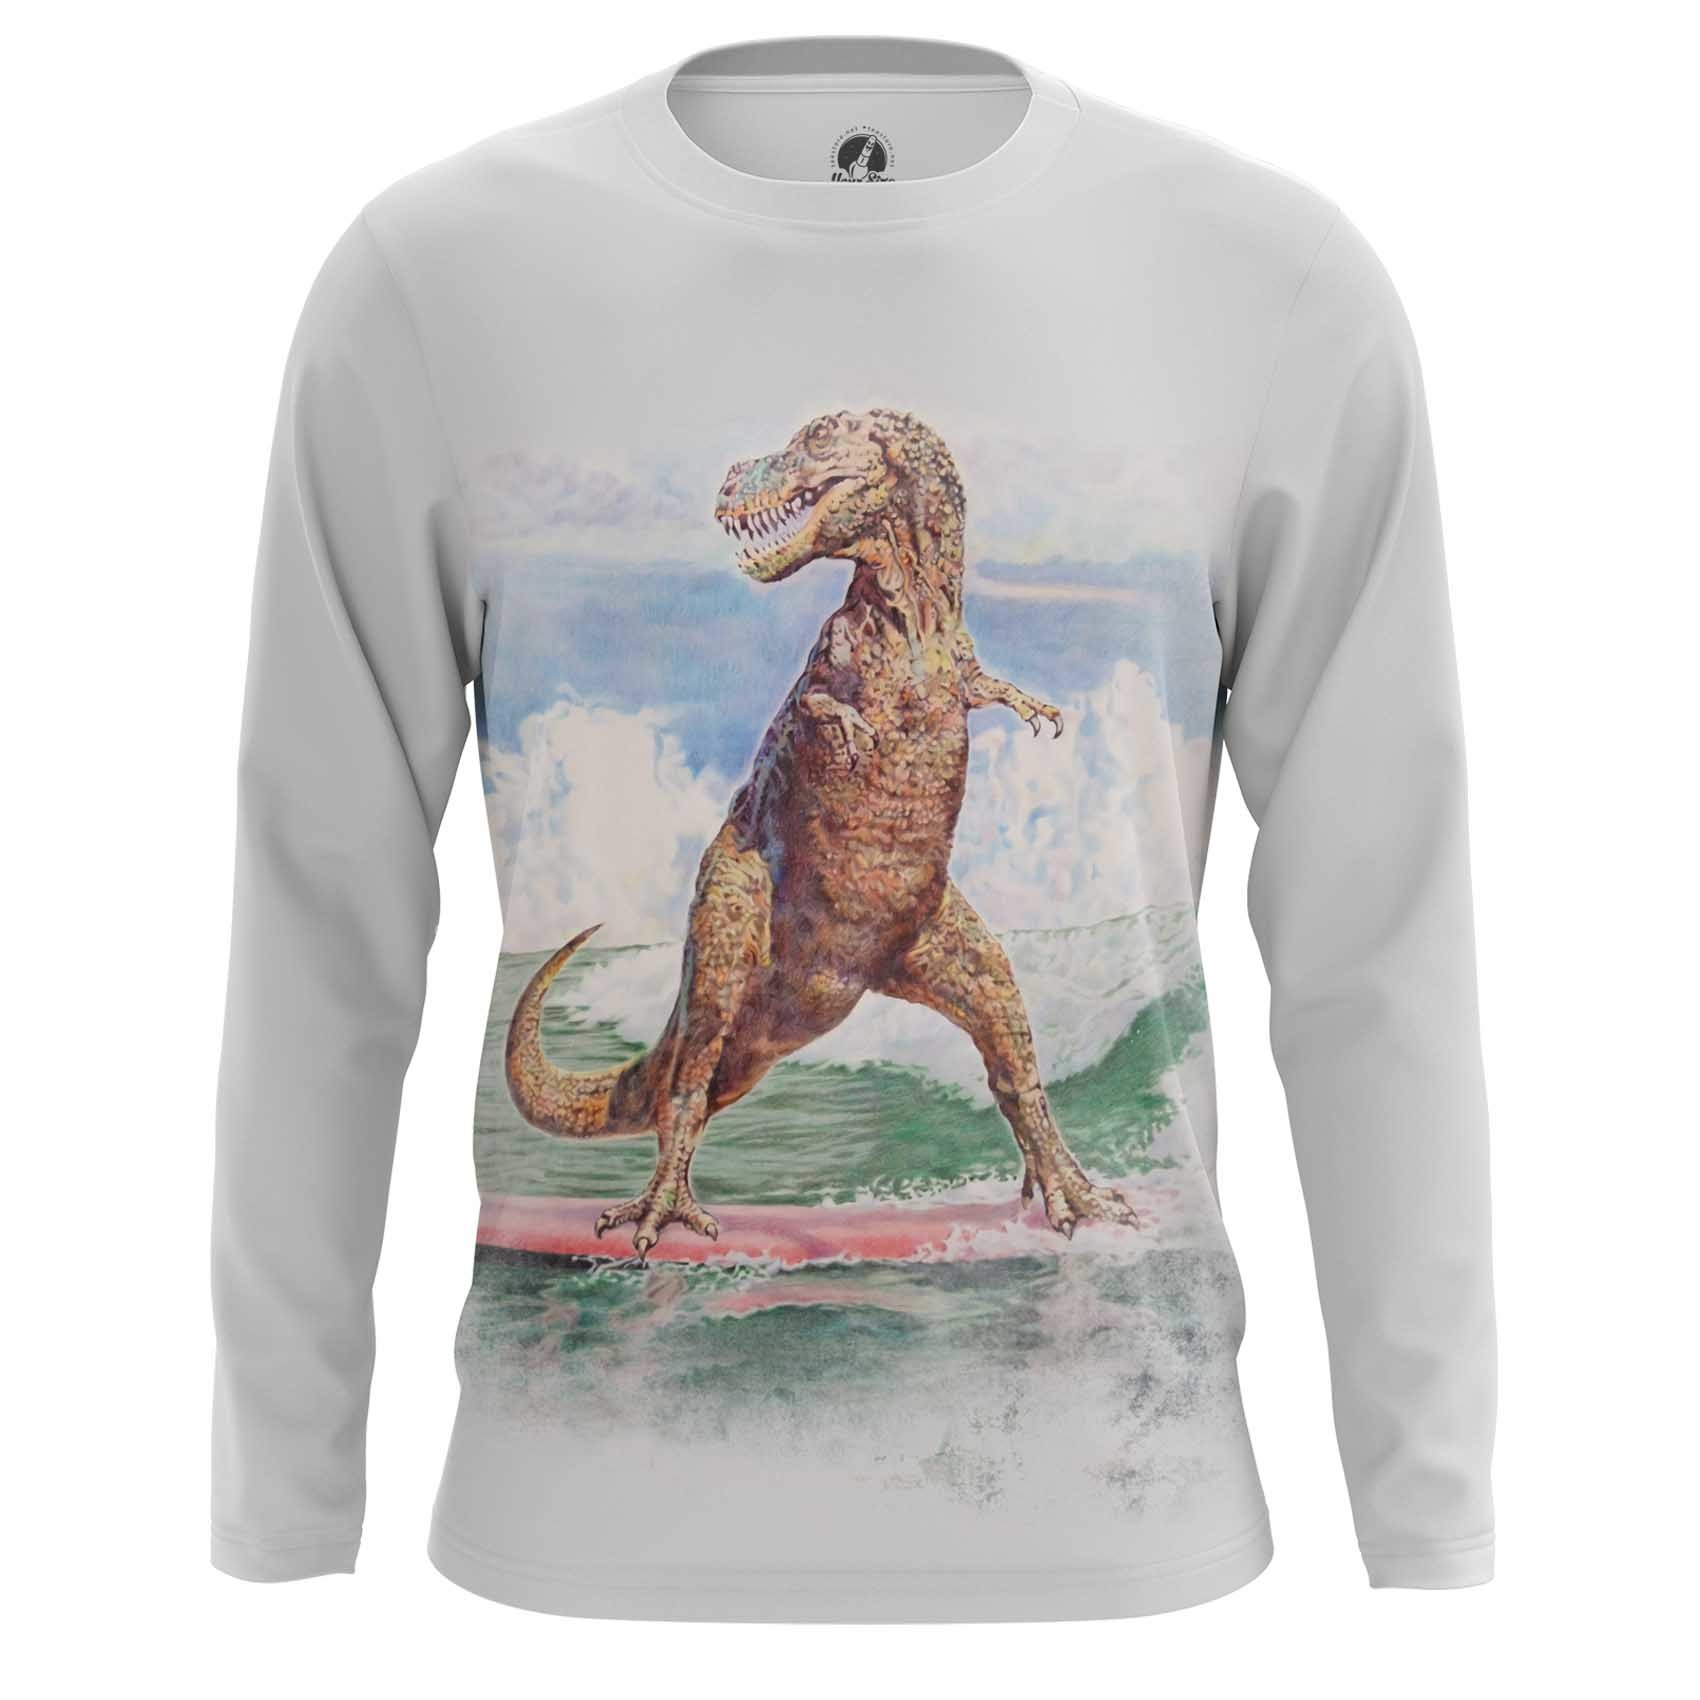 Collectibles T-Shirt Surf T-Rex Dinosaur Surfing Inspired Art